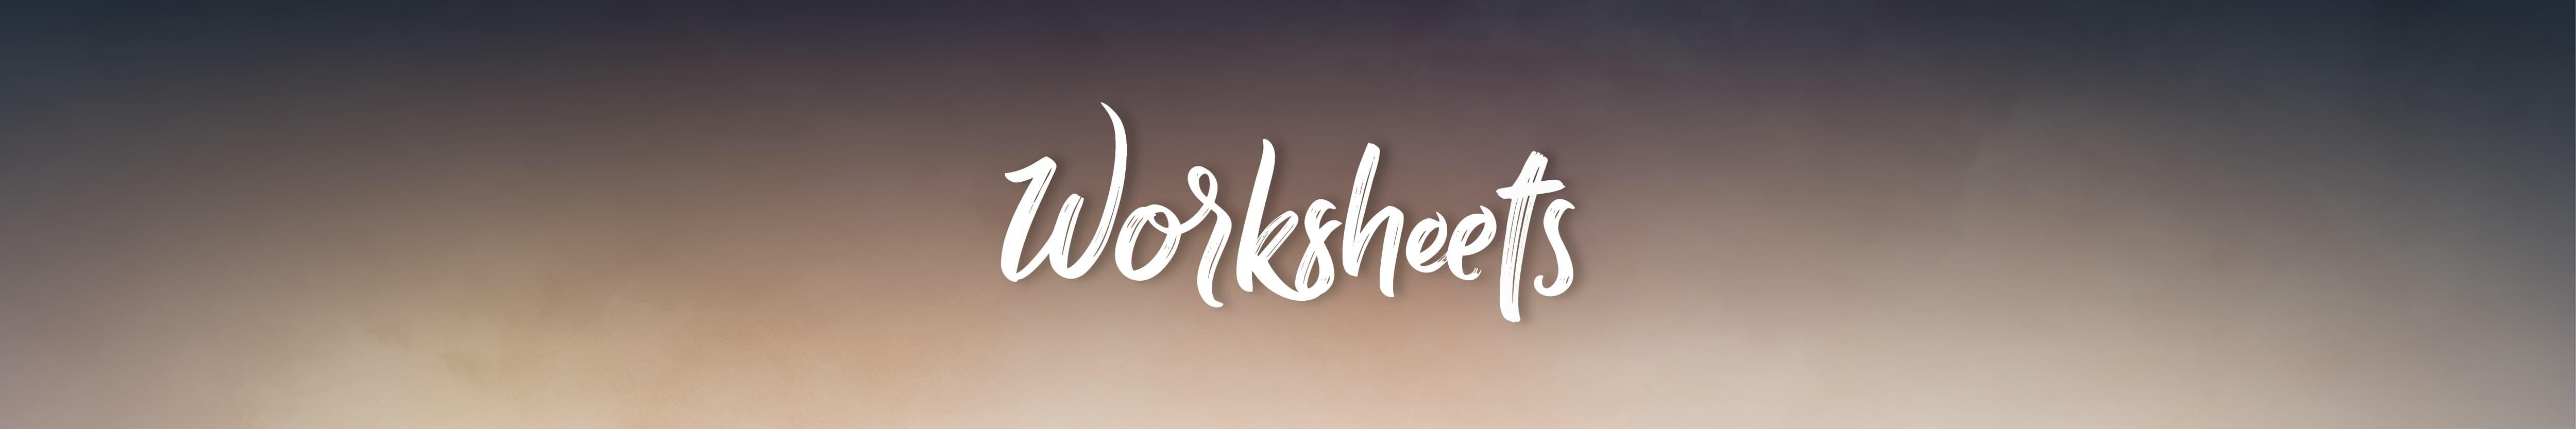 SCH_Shania_WebGraphics-PortalHeader_18_Worksheets